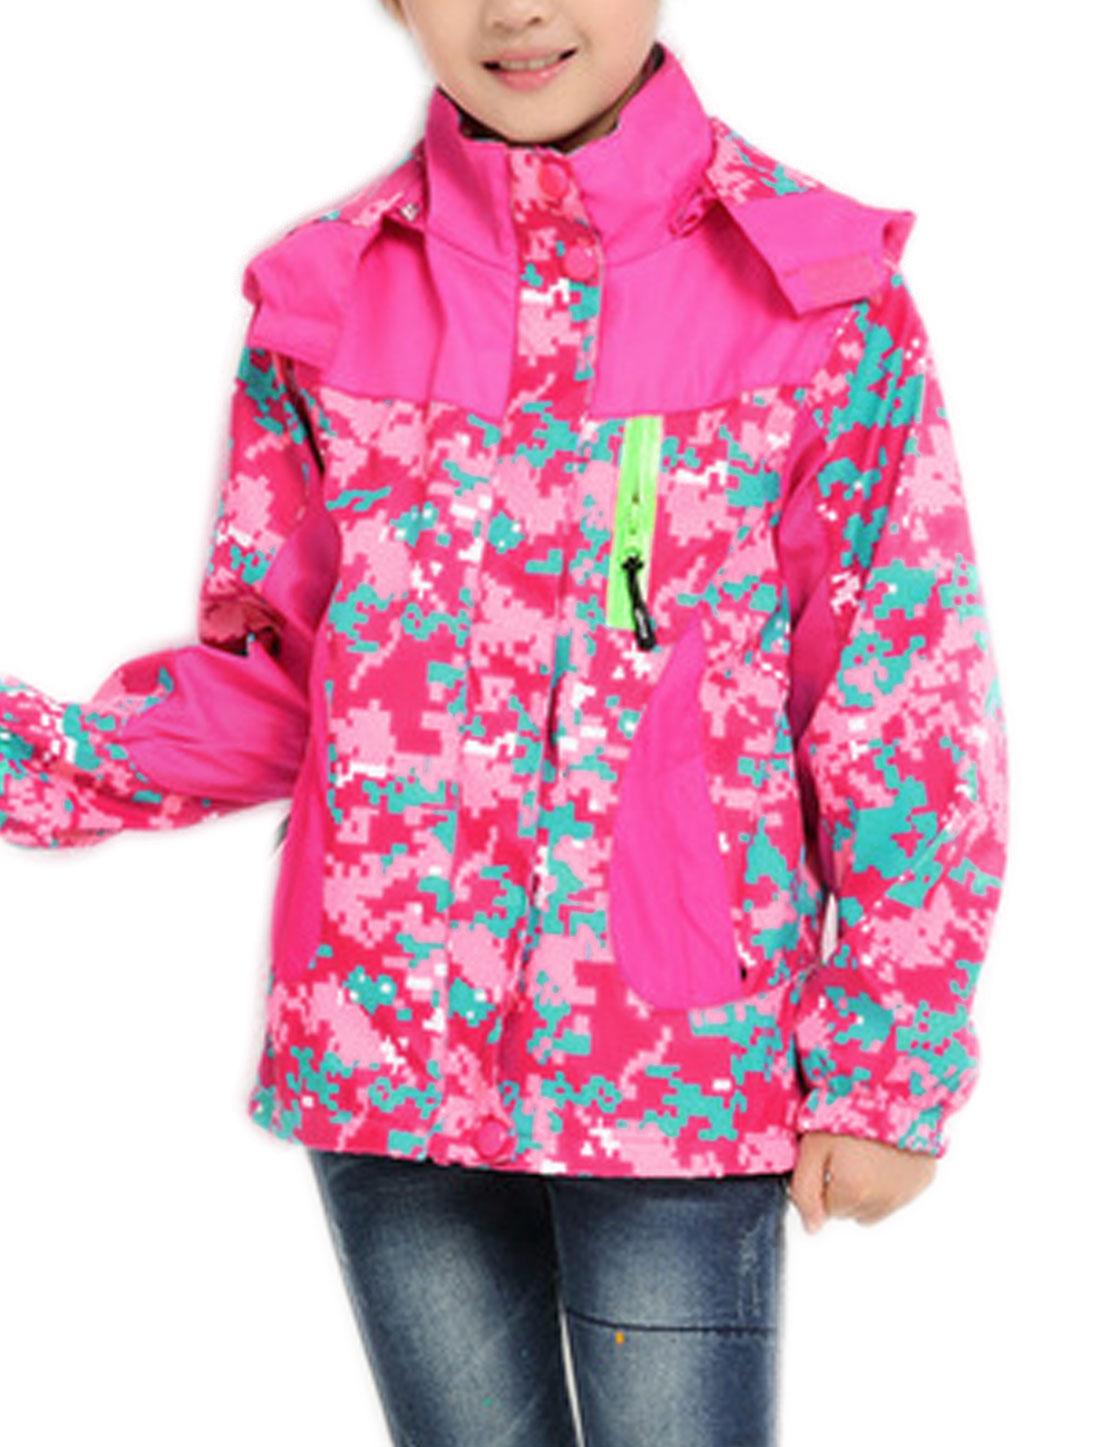 Girls Hooded Zippered Pockets Camouflage Prints Jacket Fuchsia 16